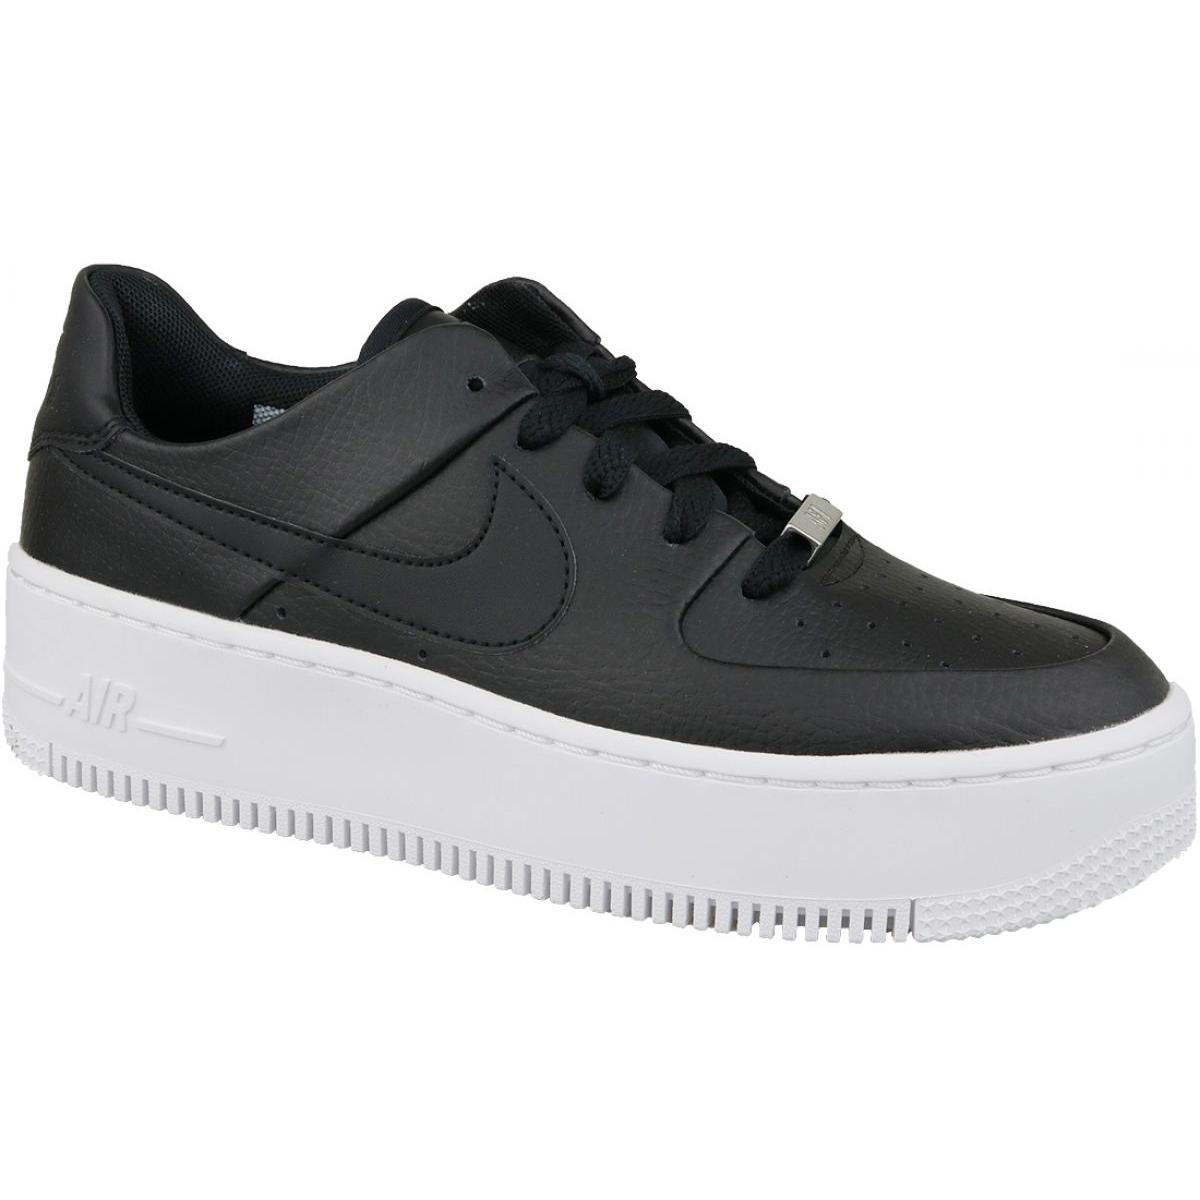 Nike Air Force 1 Sage Low W Schuhe AR5339 002 schwarz